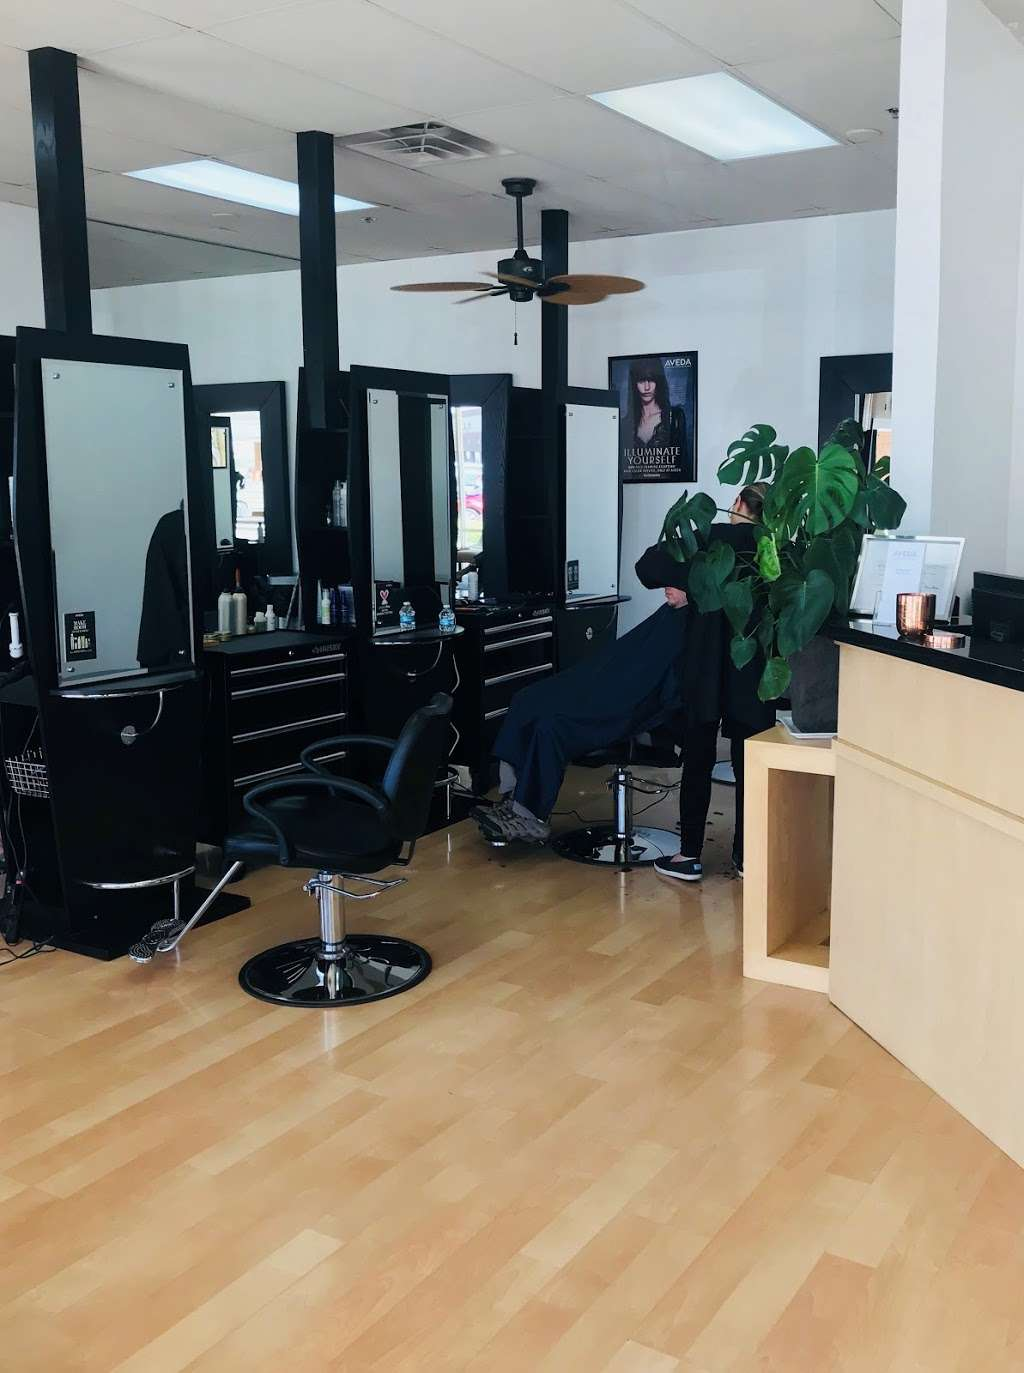 Waters + Co Salon - hair care  | Photo 3 of 10 | Address: 8664 E Shea Blvd Ste 158, Scottsdale, AZ 85260, USA | Phone: (480) 970-1711